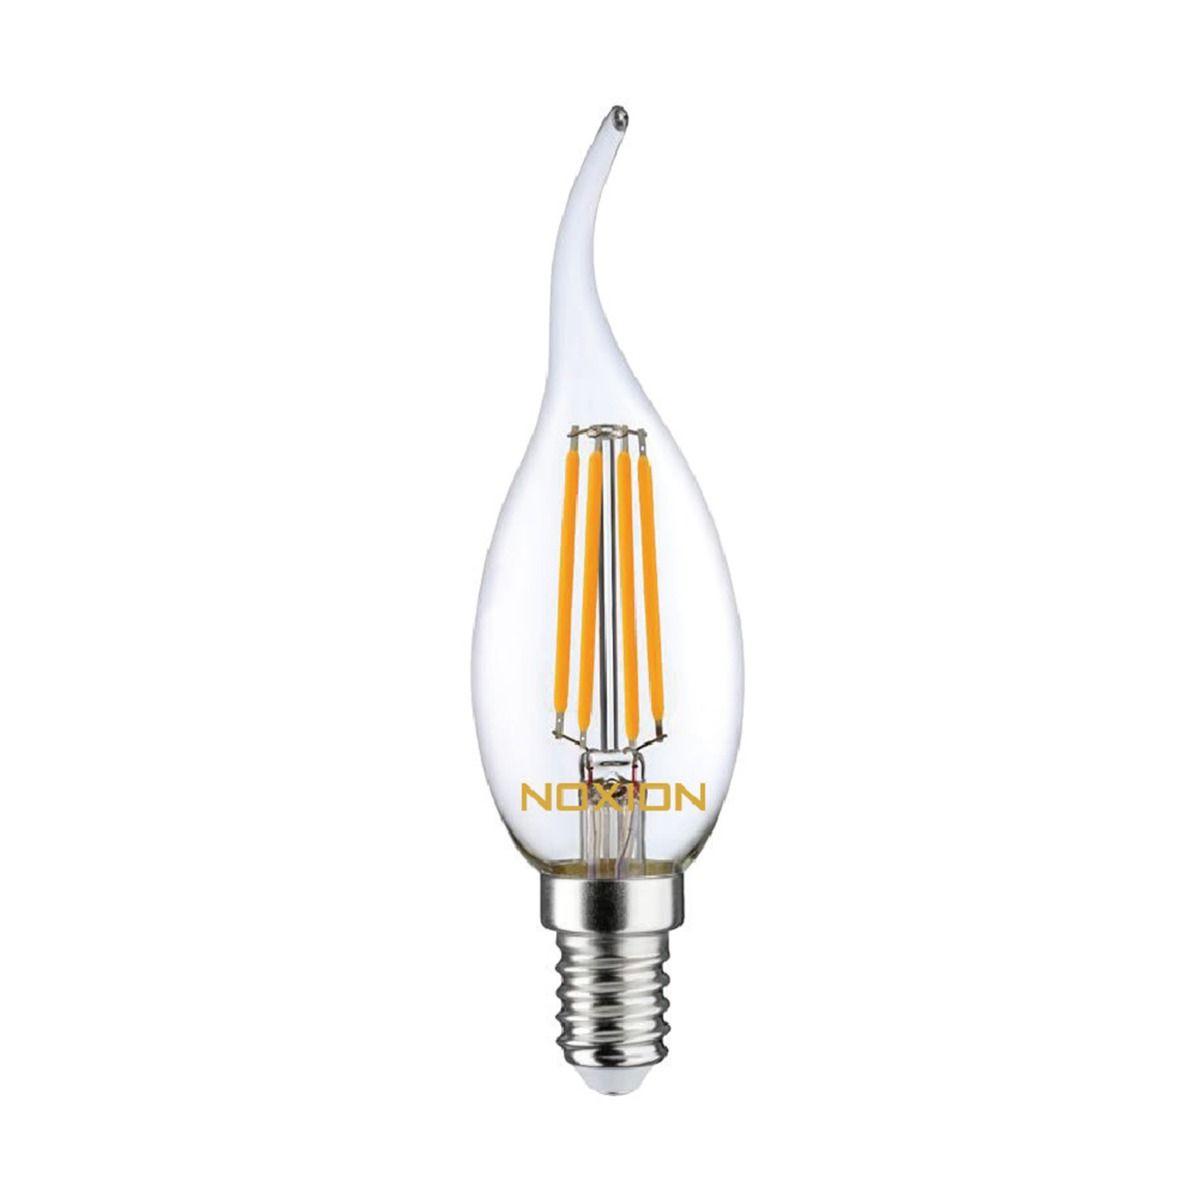 Noxion Lucent filament LED Candle 4.5W 827 BA35 E14 klar   dimbar - ekstra varm hvit - erstatter 40W